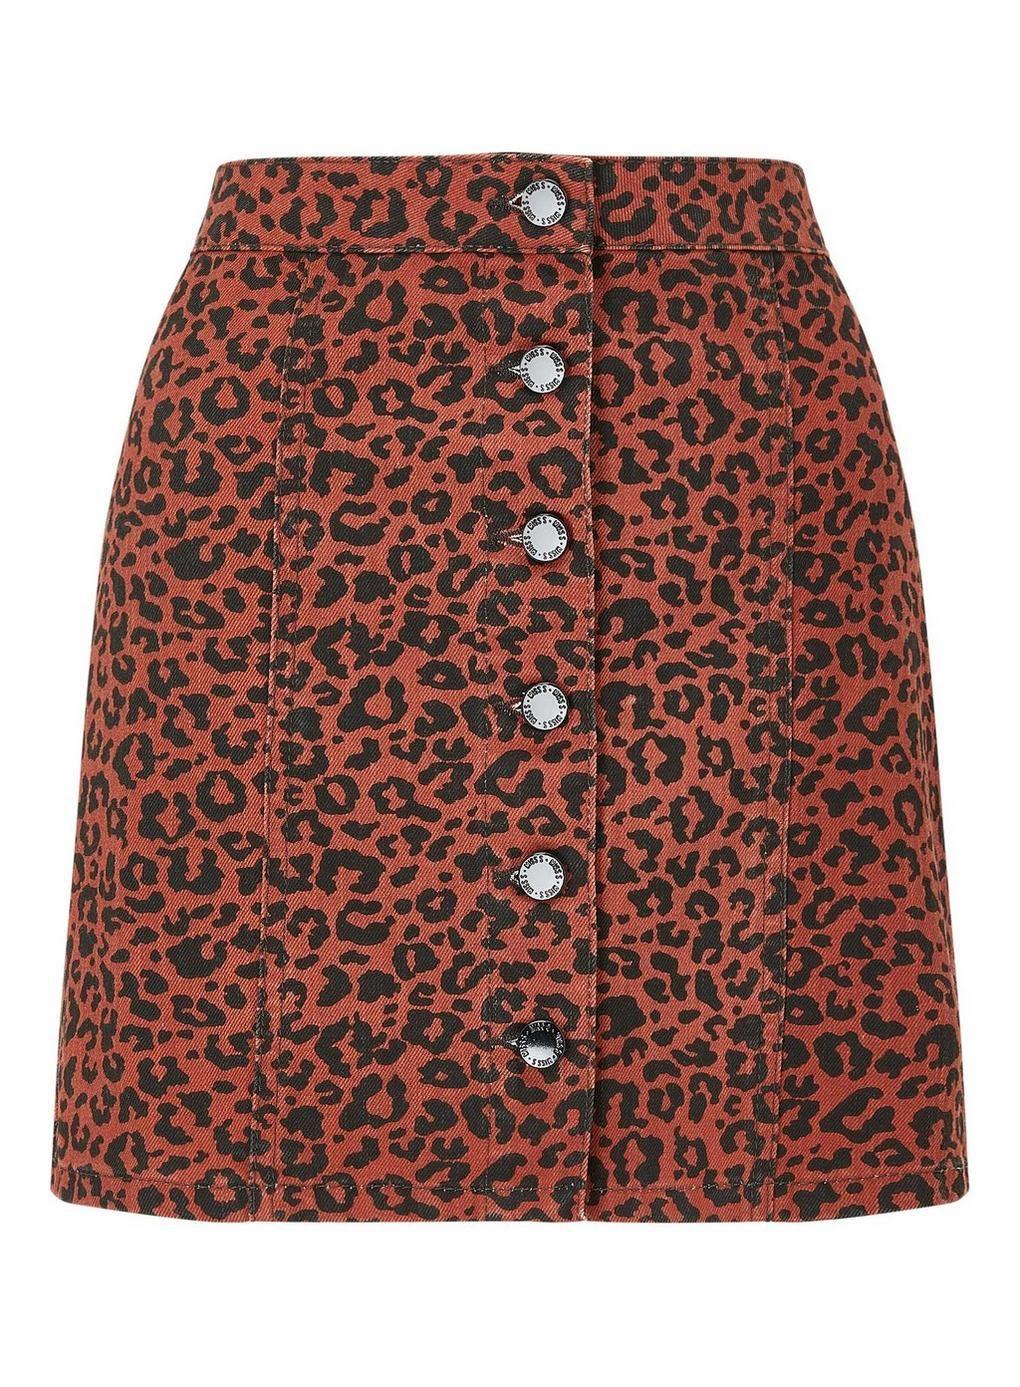 34dcaa41a9 Leopard Print Denim Skirt - Colour of the Season - Clothing - Miss Selfridge